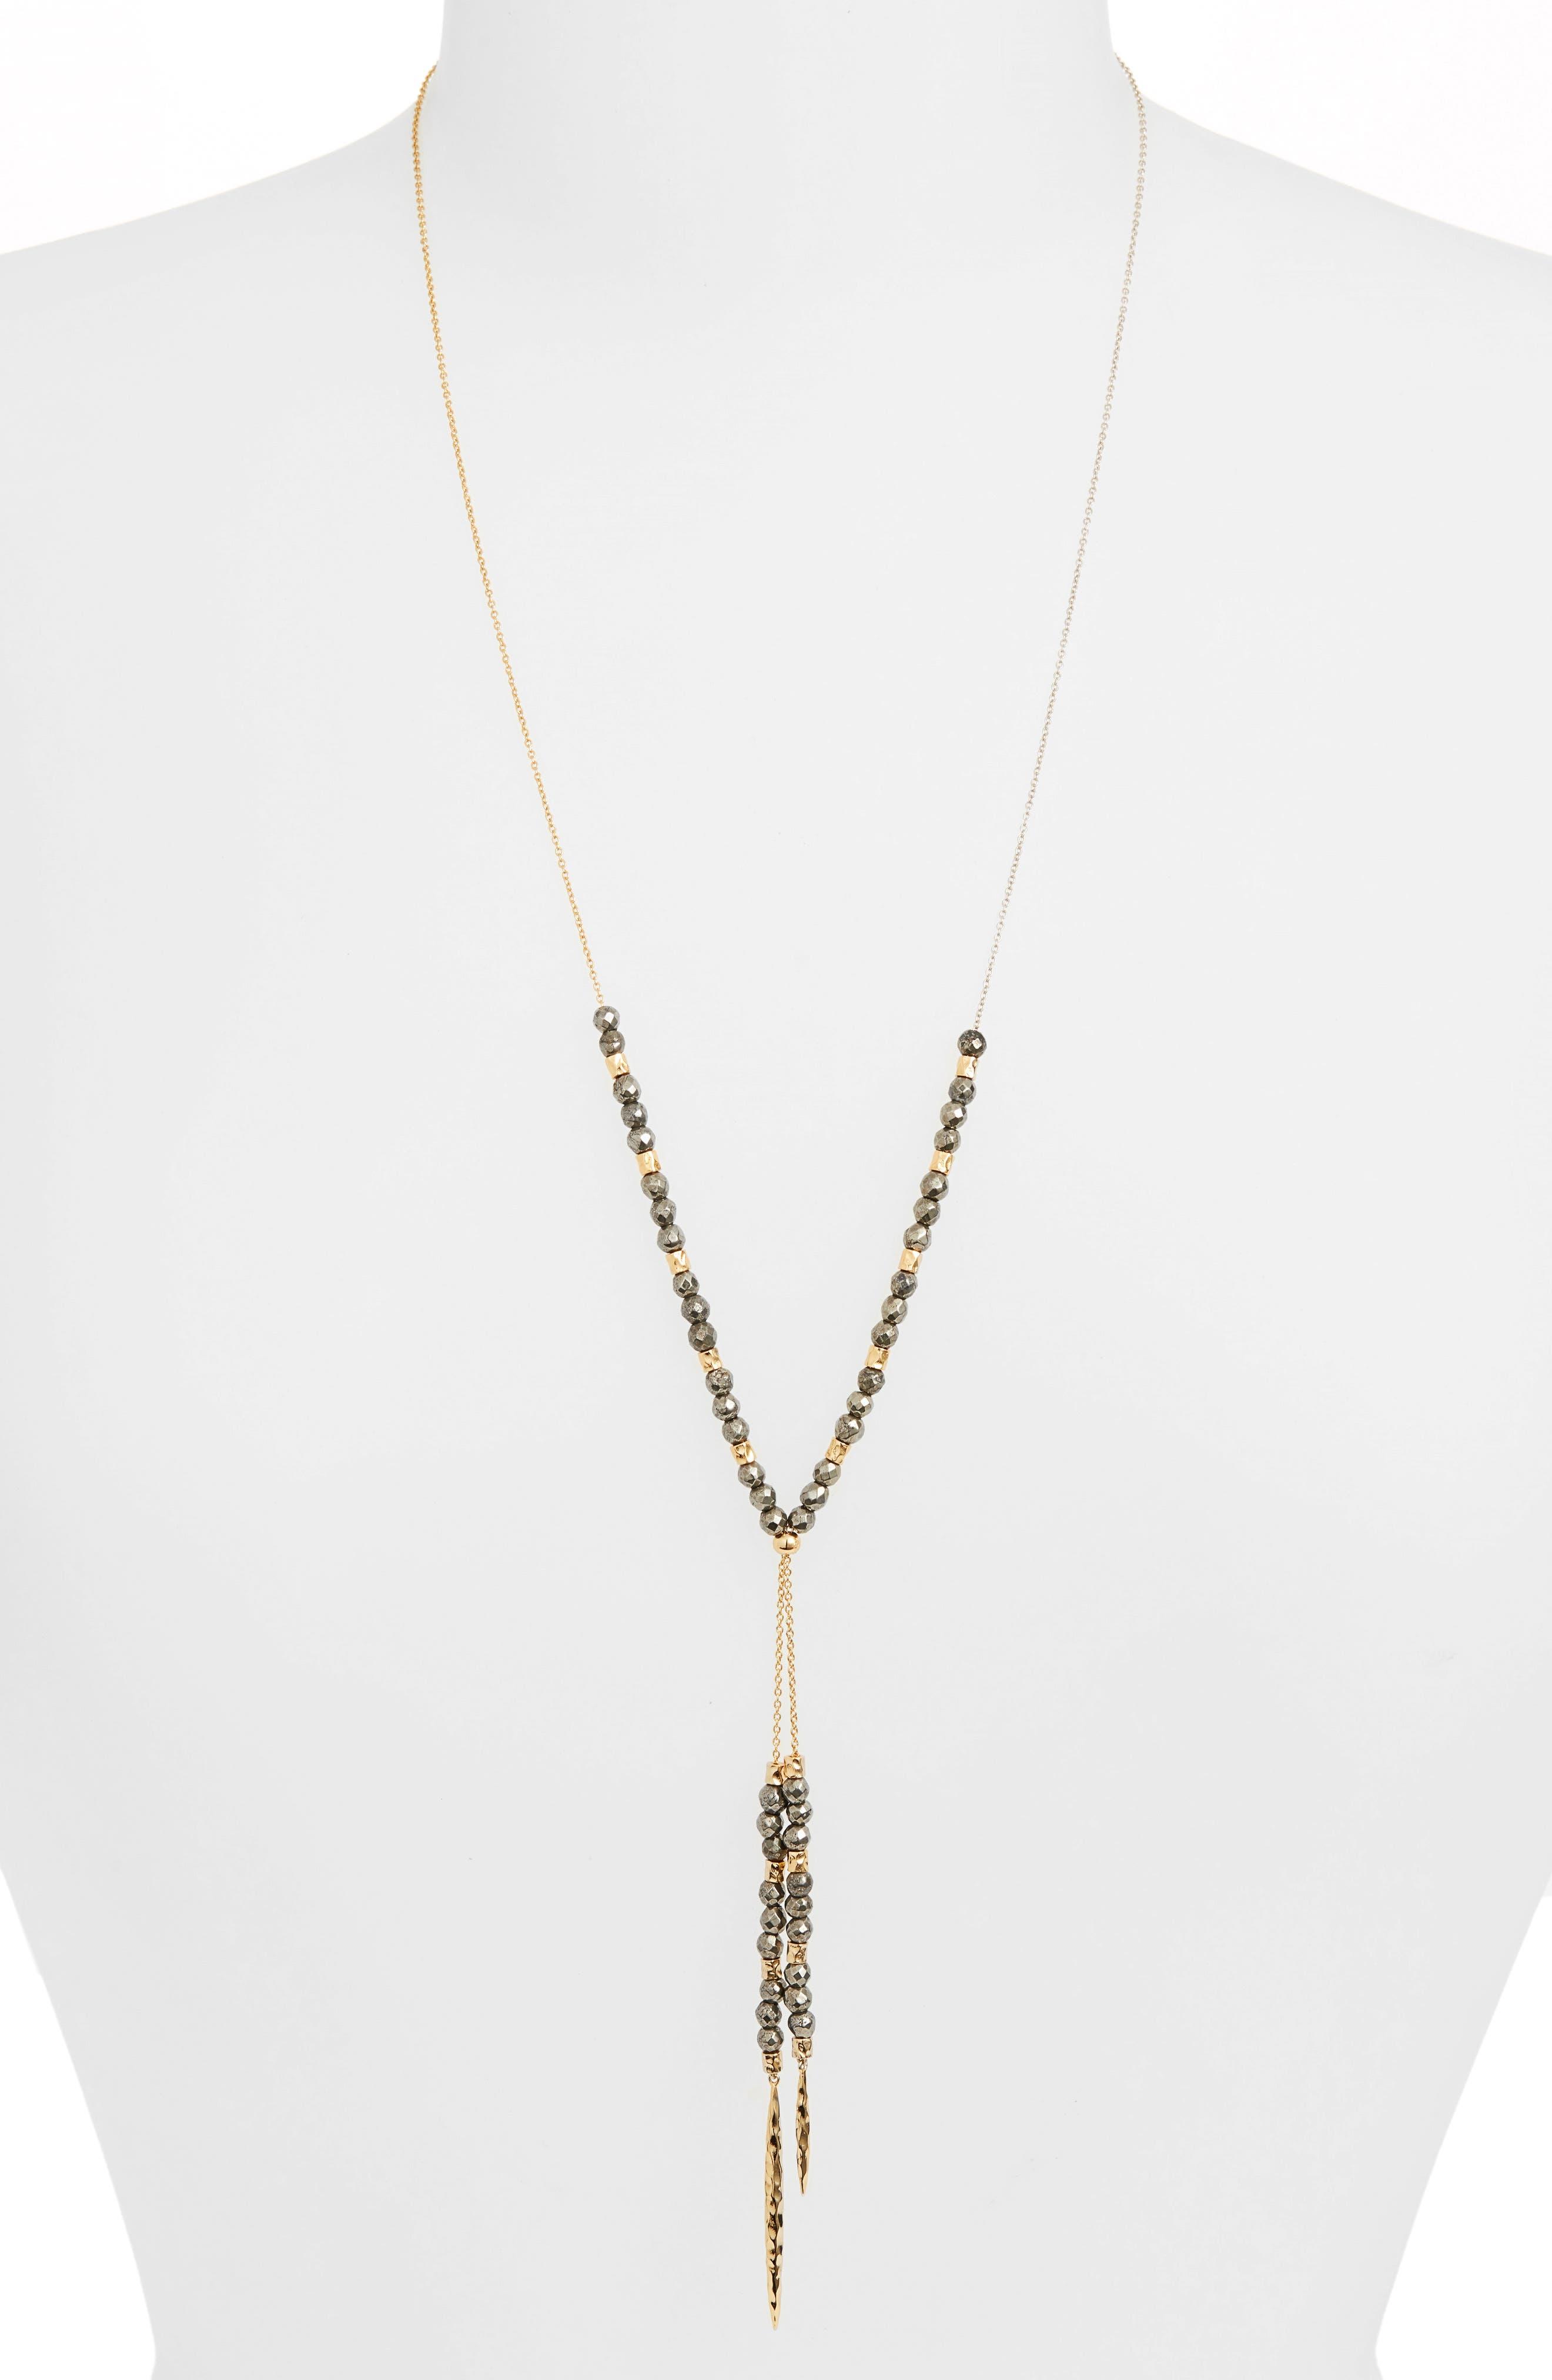 Alternate Image 1 Selected - gorjana Power Stone Semiprecious Stone Necklace